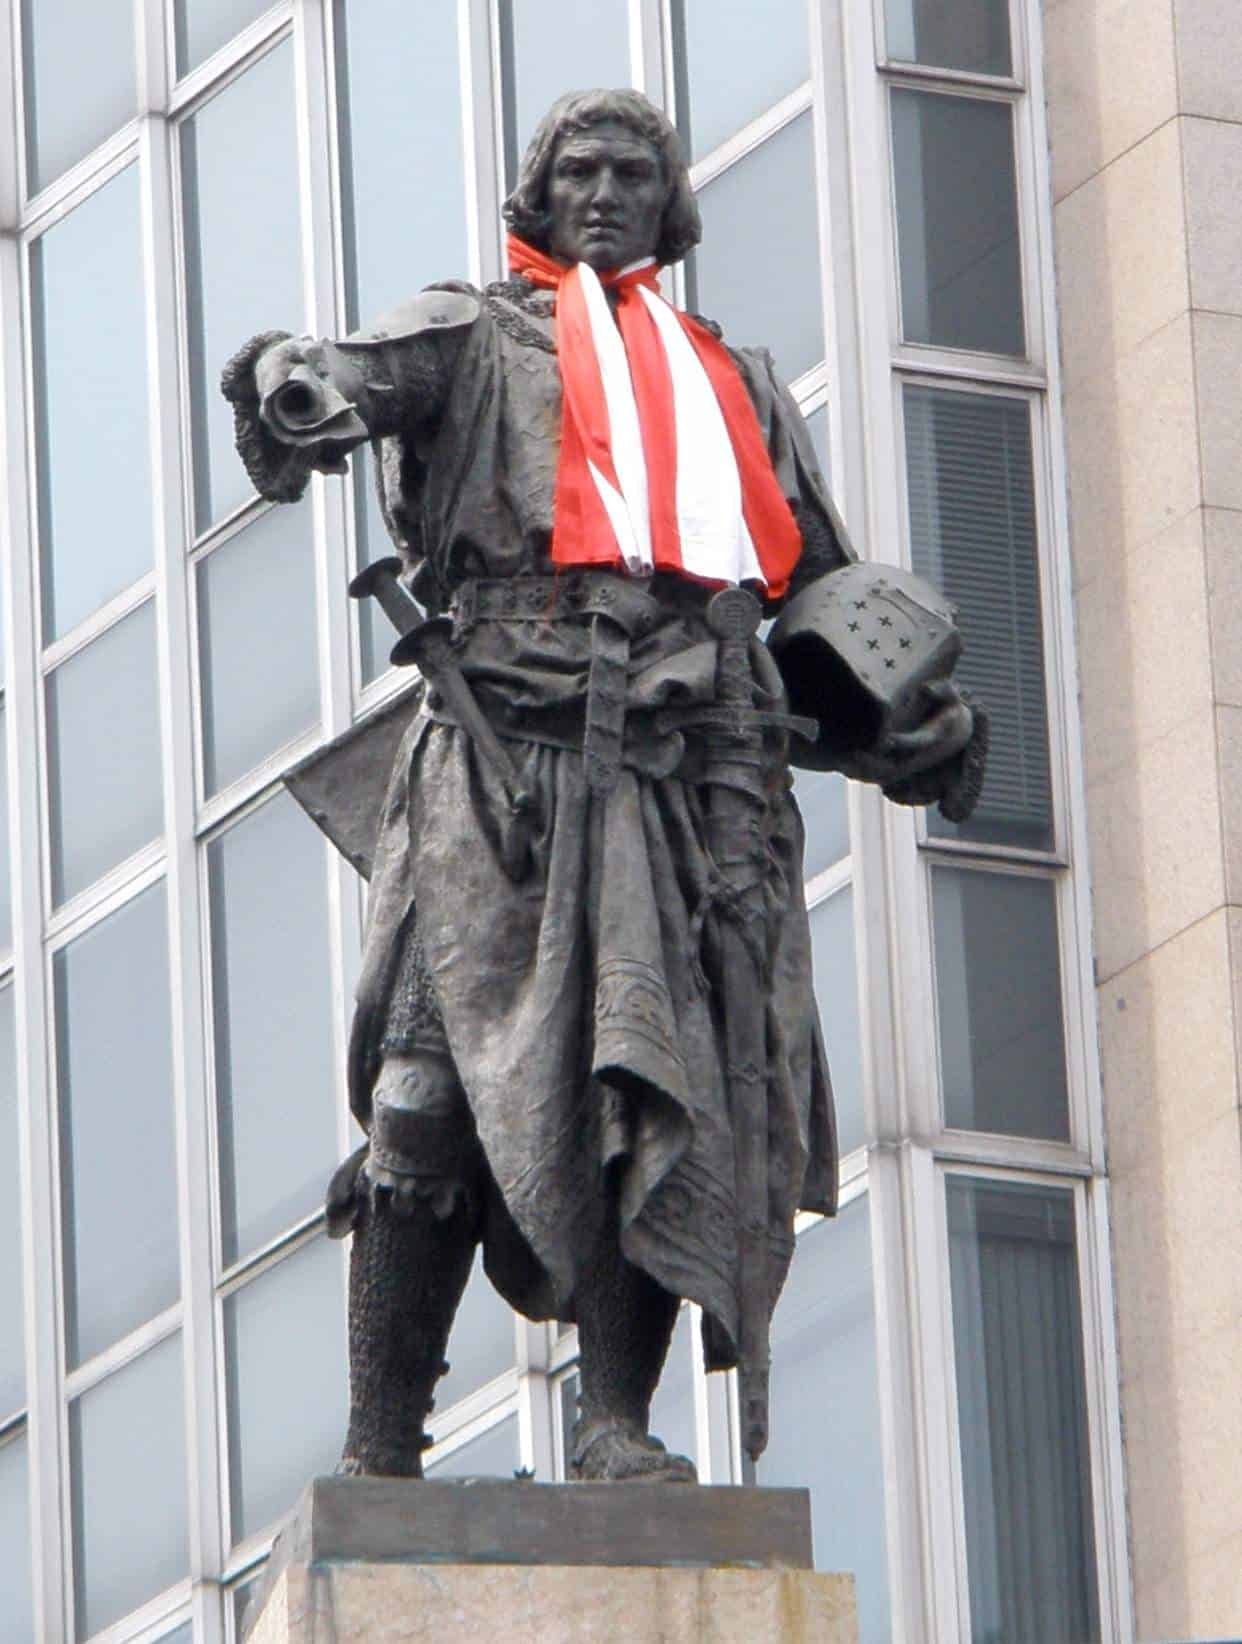 A monument to Diego Lopez V de Haro in Bilbao